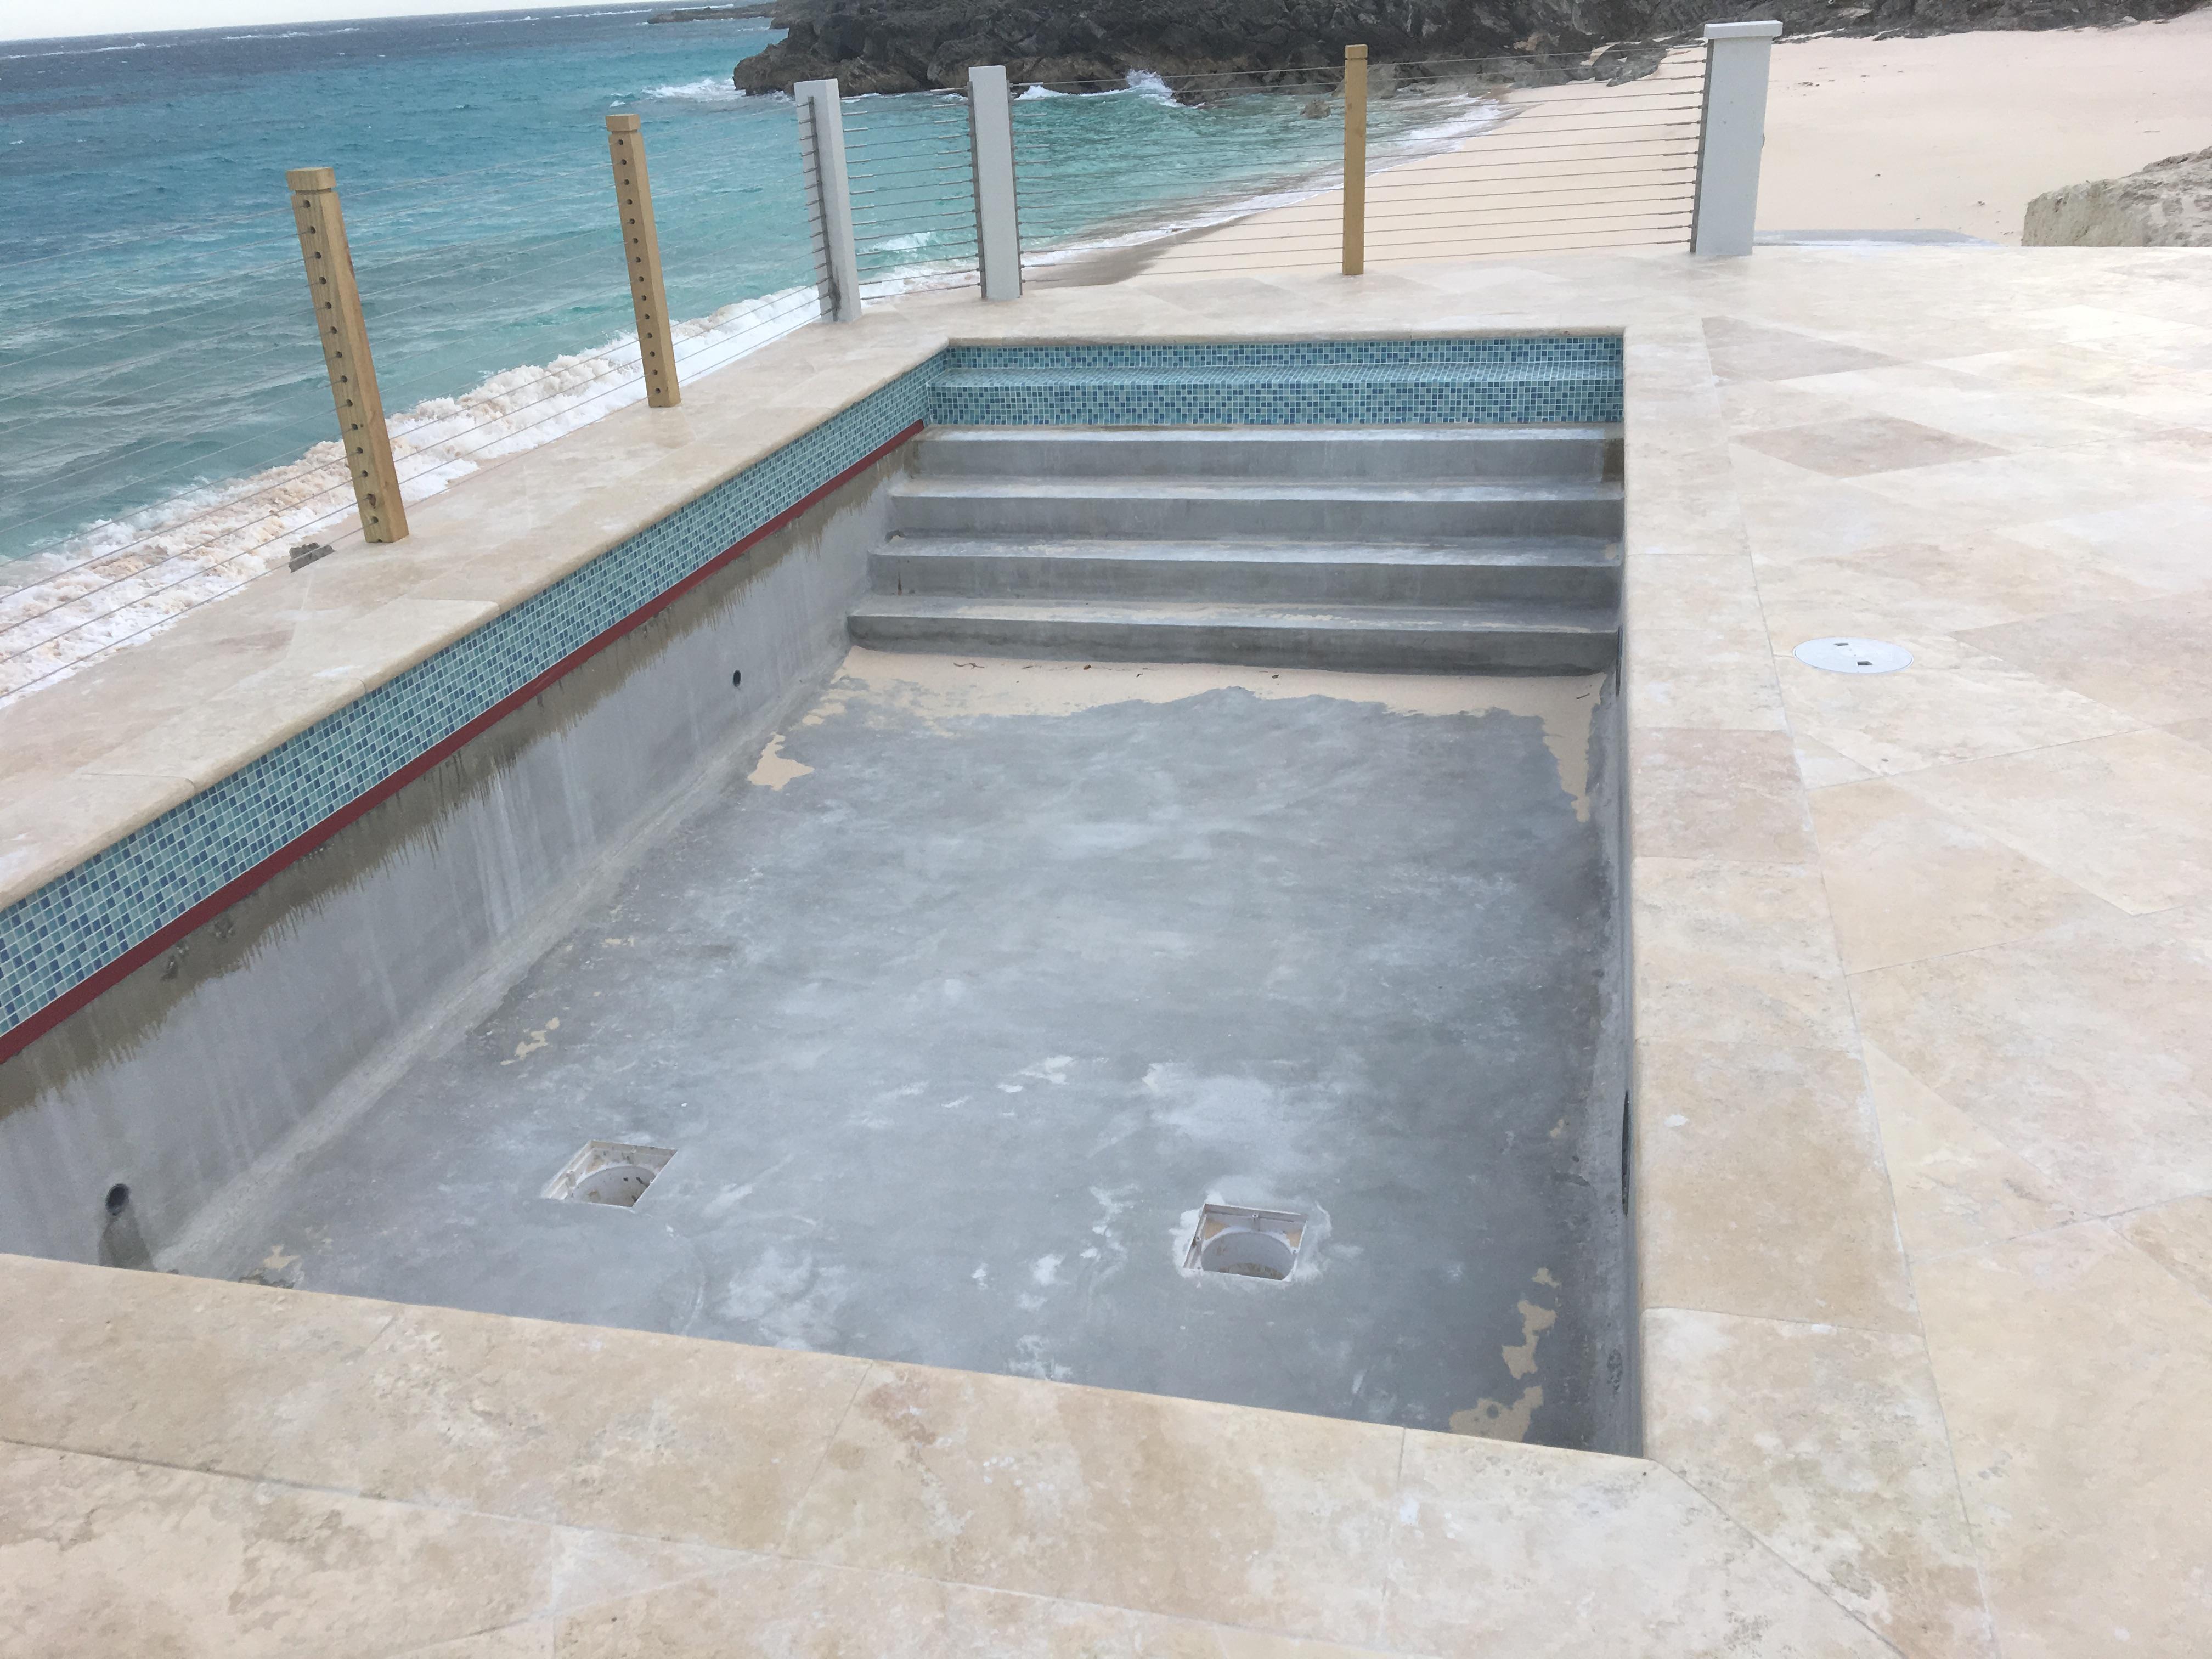 Bermuda Commercial Epoxy Swimming Pool Paint Project Aqua Guard 5000